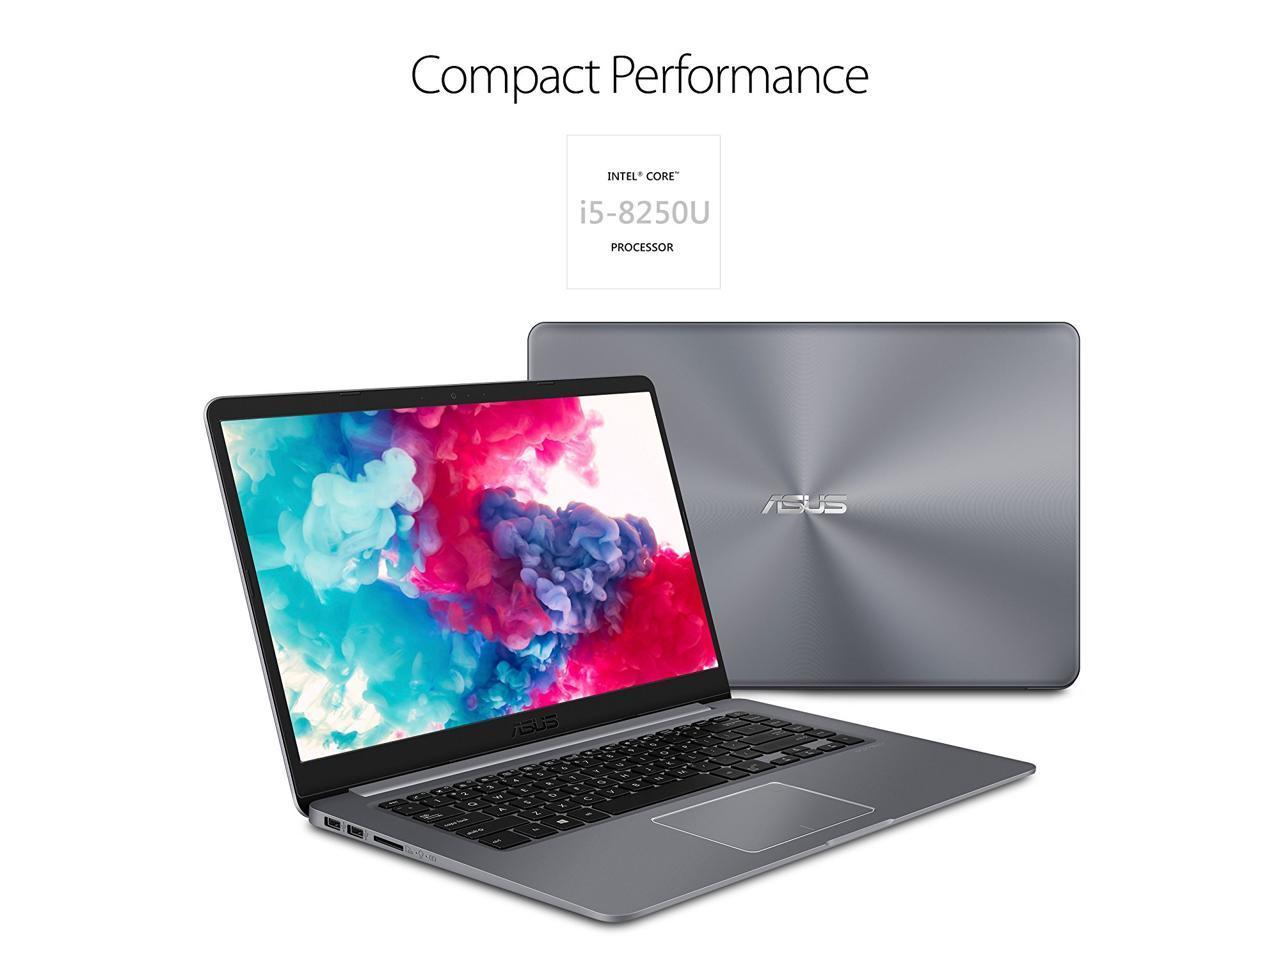 2018 ASUS VivoBook F510UA Full HD Ultra-Narrow Laptop | Intel Core i5-8250U |  8GB RAM  | 1TB HDD | USB-C |  NanoEdge anti-glare Display |  Fingerprint | HDMI |  Windows 10 | Star Gray